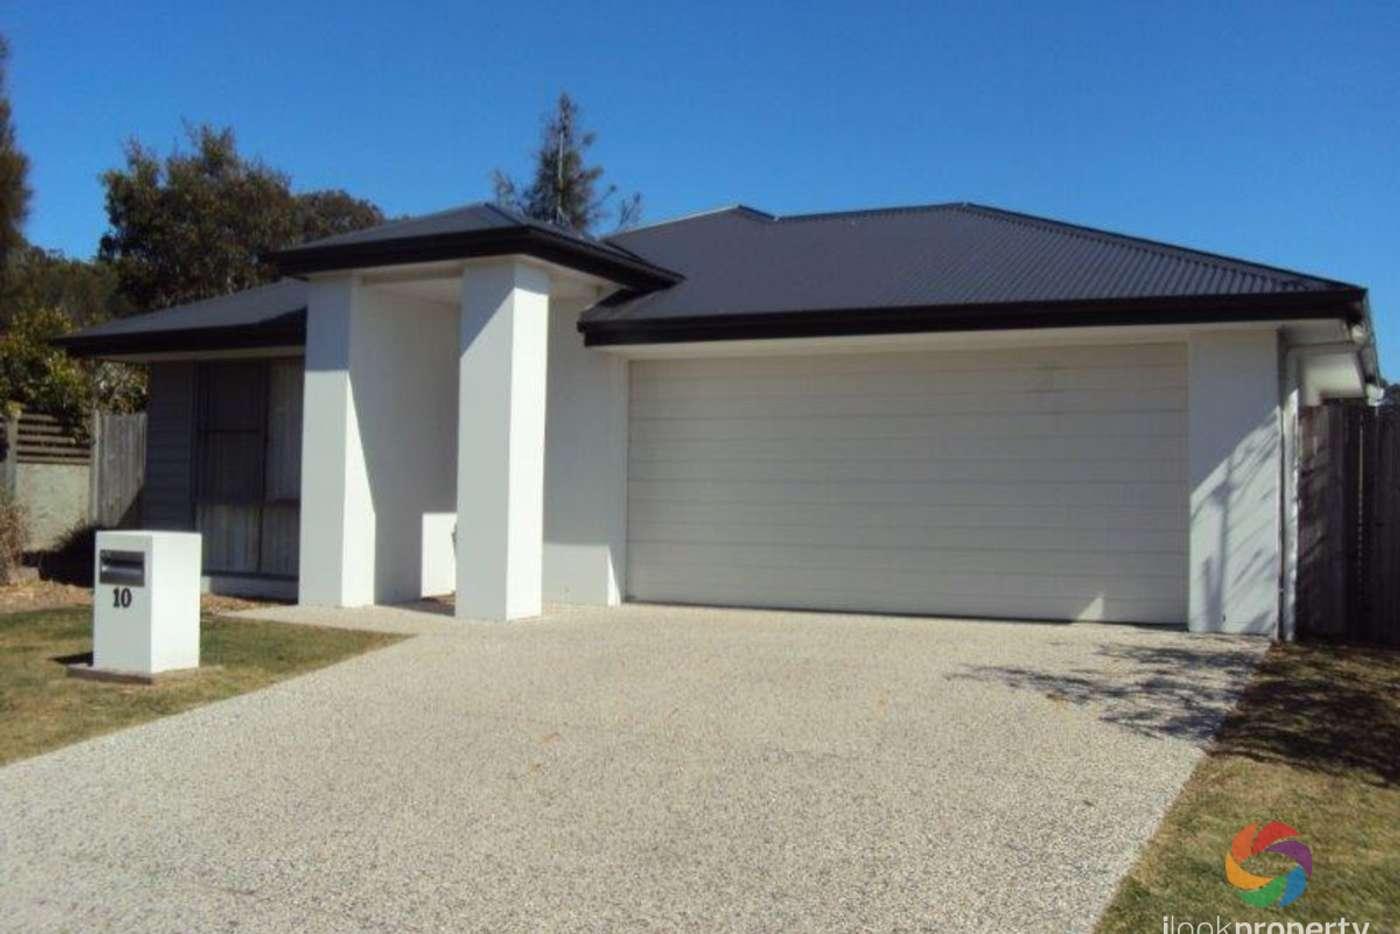 Main view of Homely house listing, 10 Banyandah Close, Birtinya QLD 4575